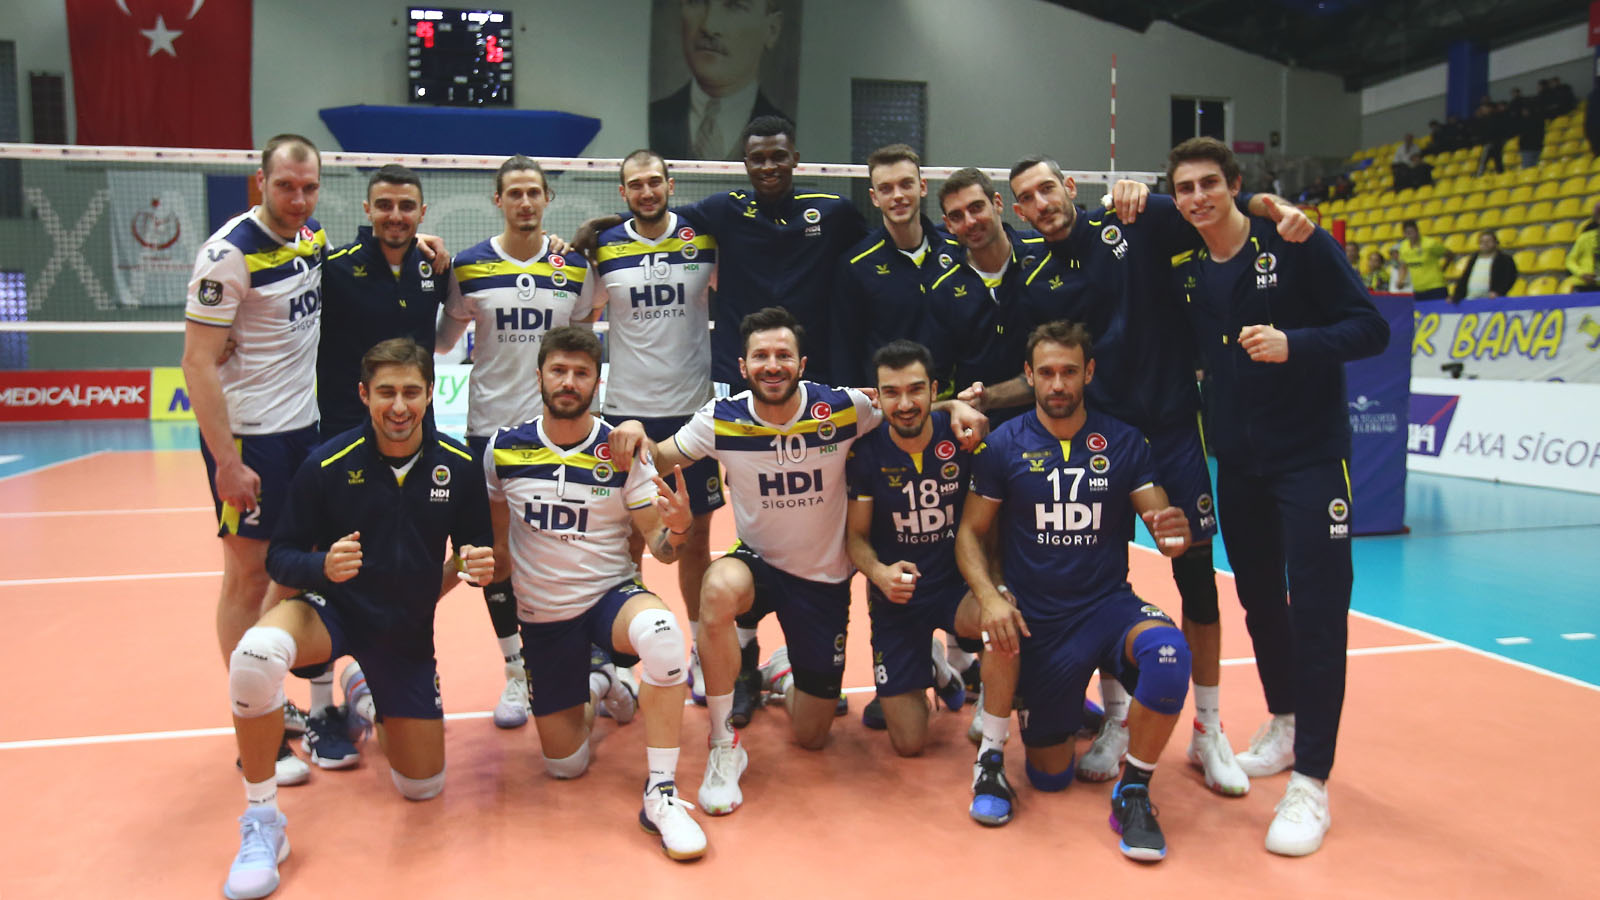 İstanbul BBSK 1-3 Fenerbahçe HDI Sigorta